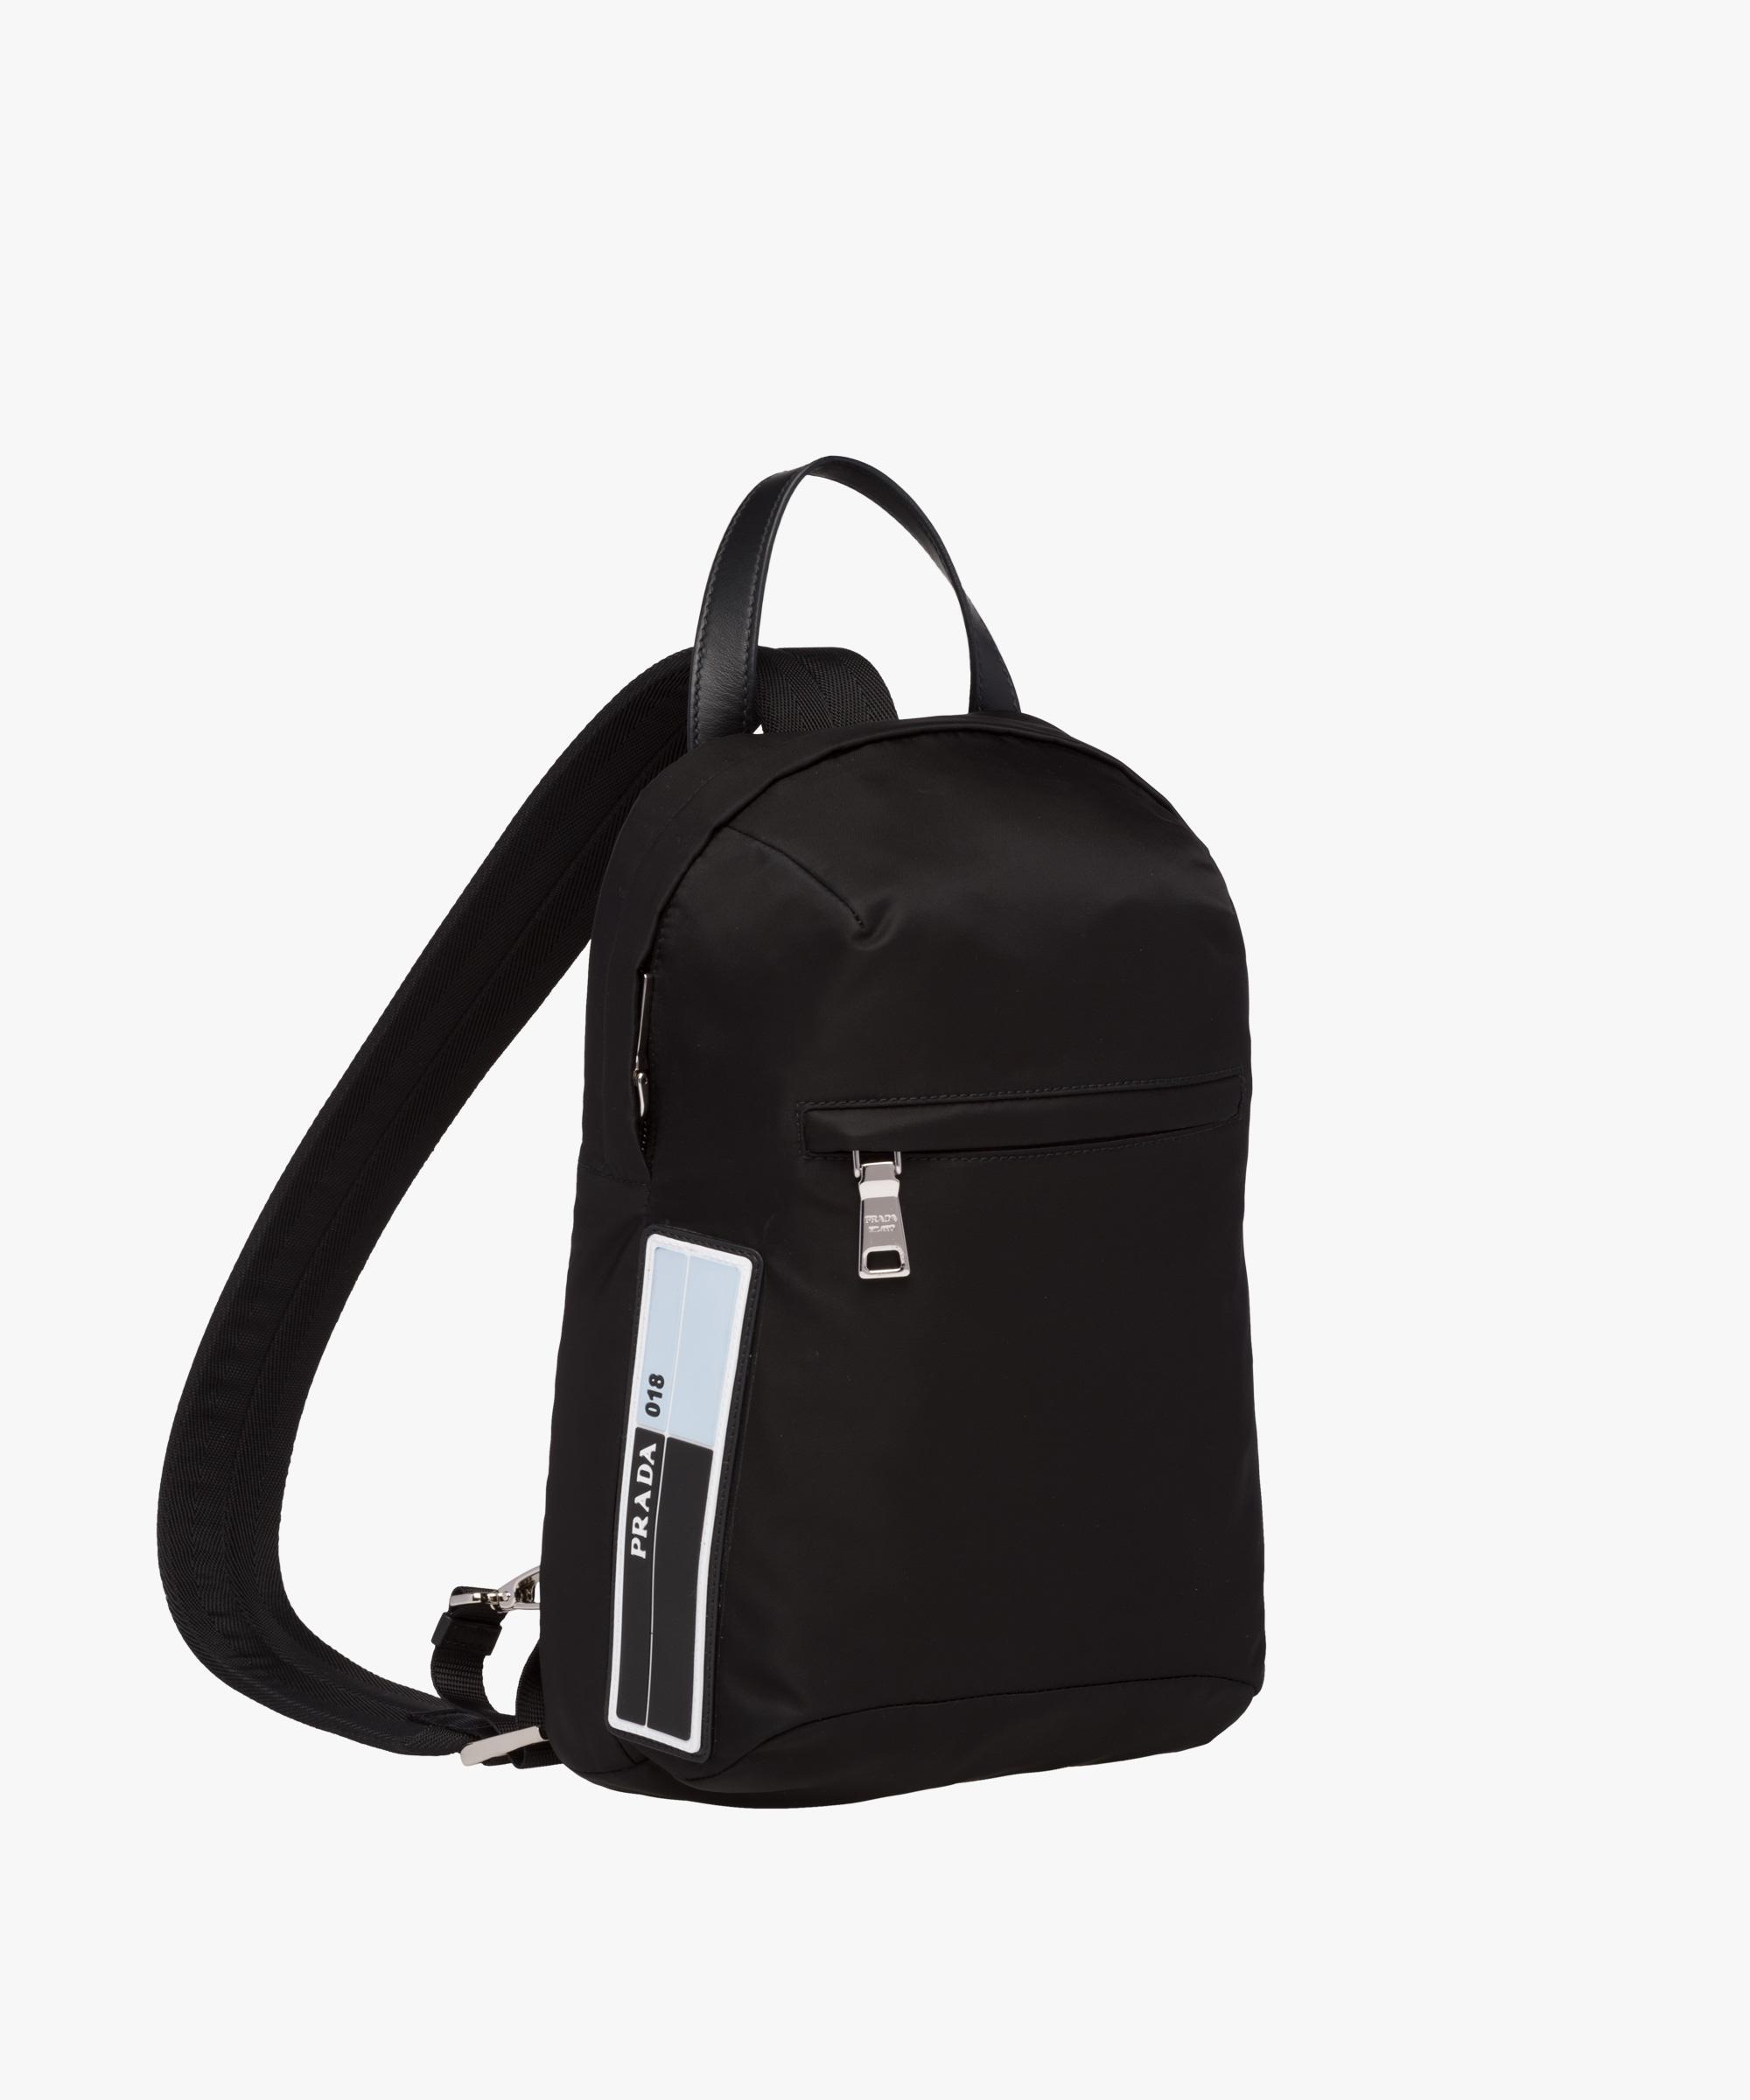 d99944ded798 Lyst - Prada Nylon One-shoulder Backpack in Black for Men